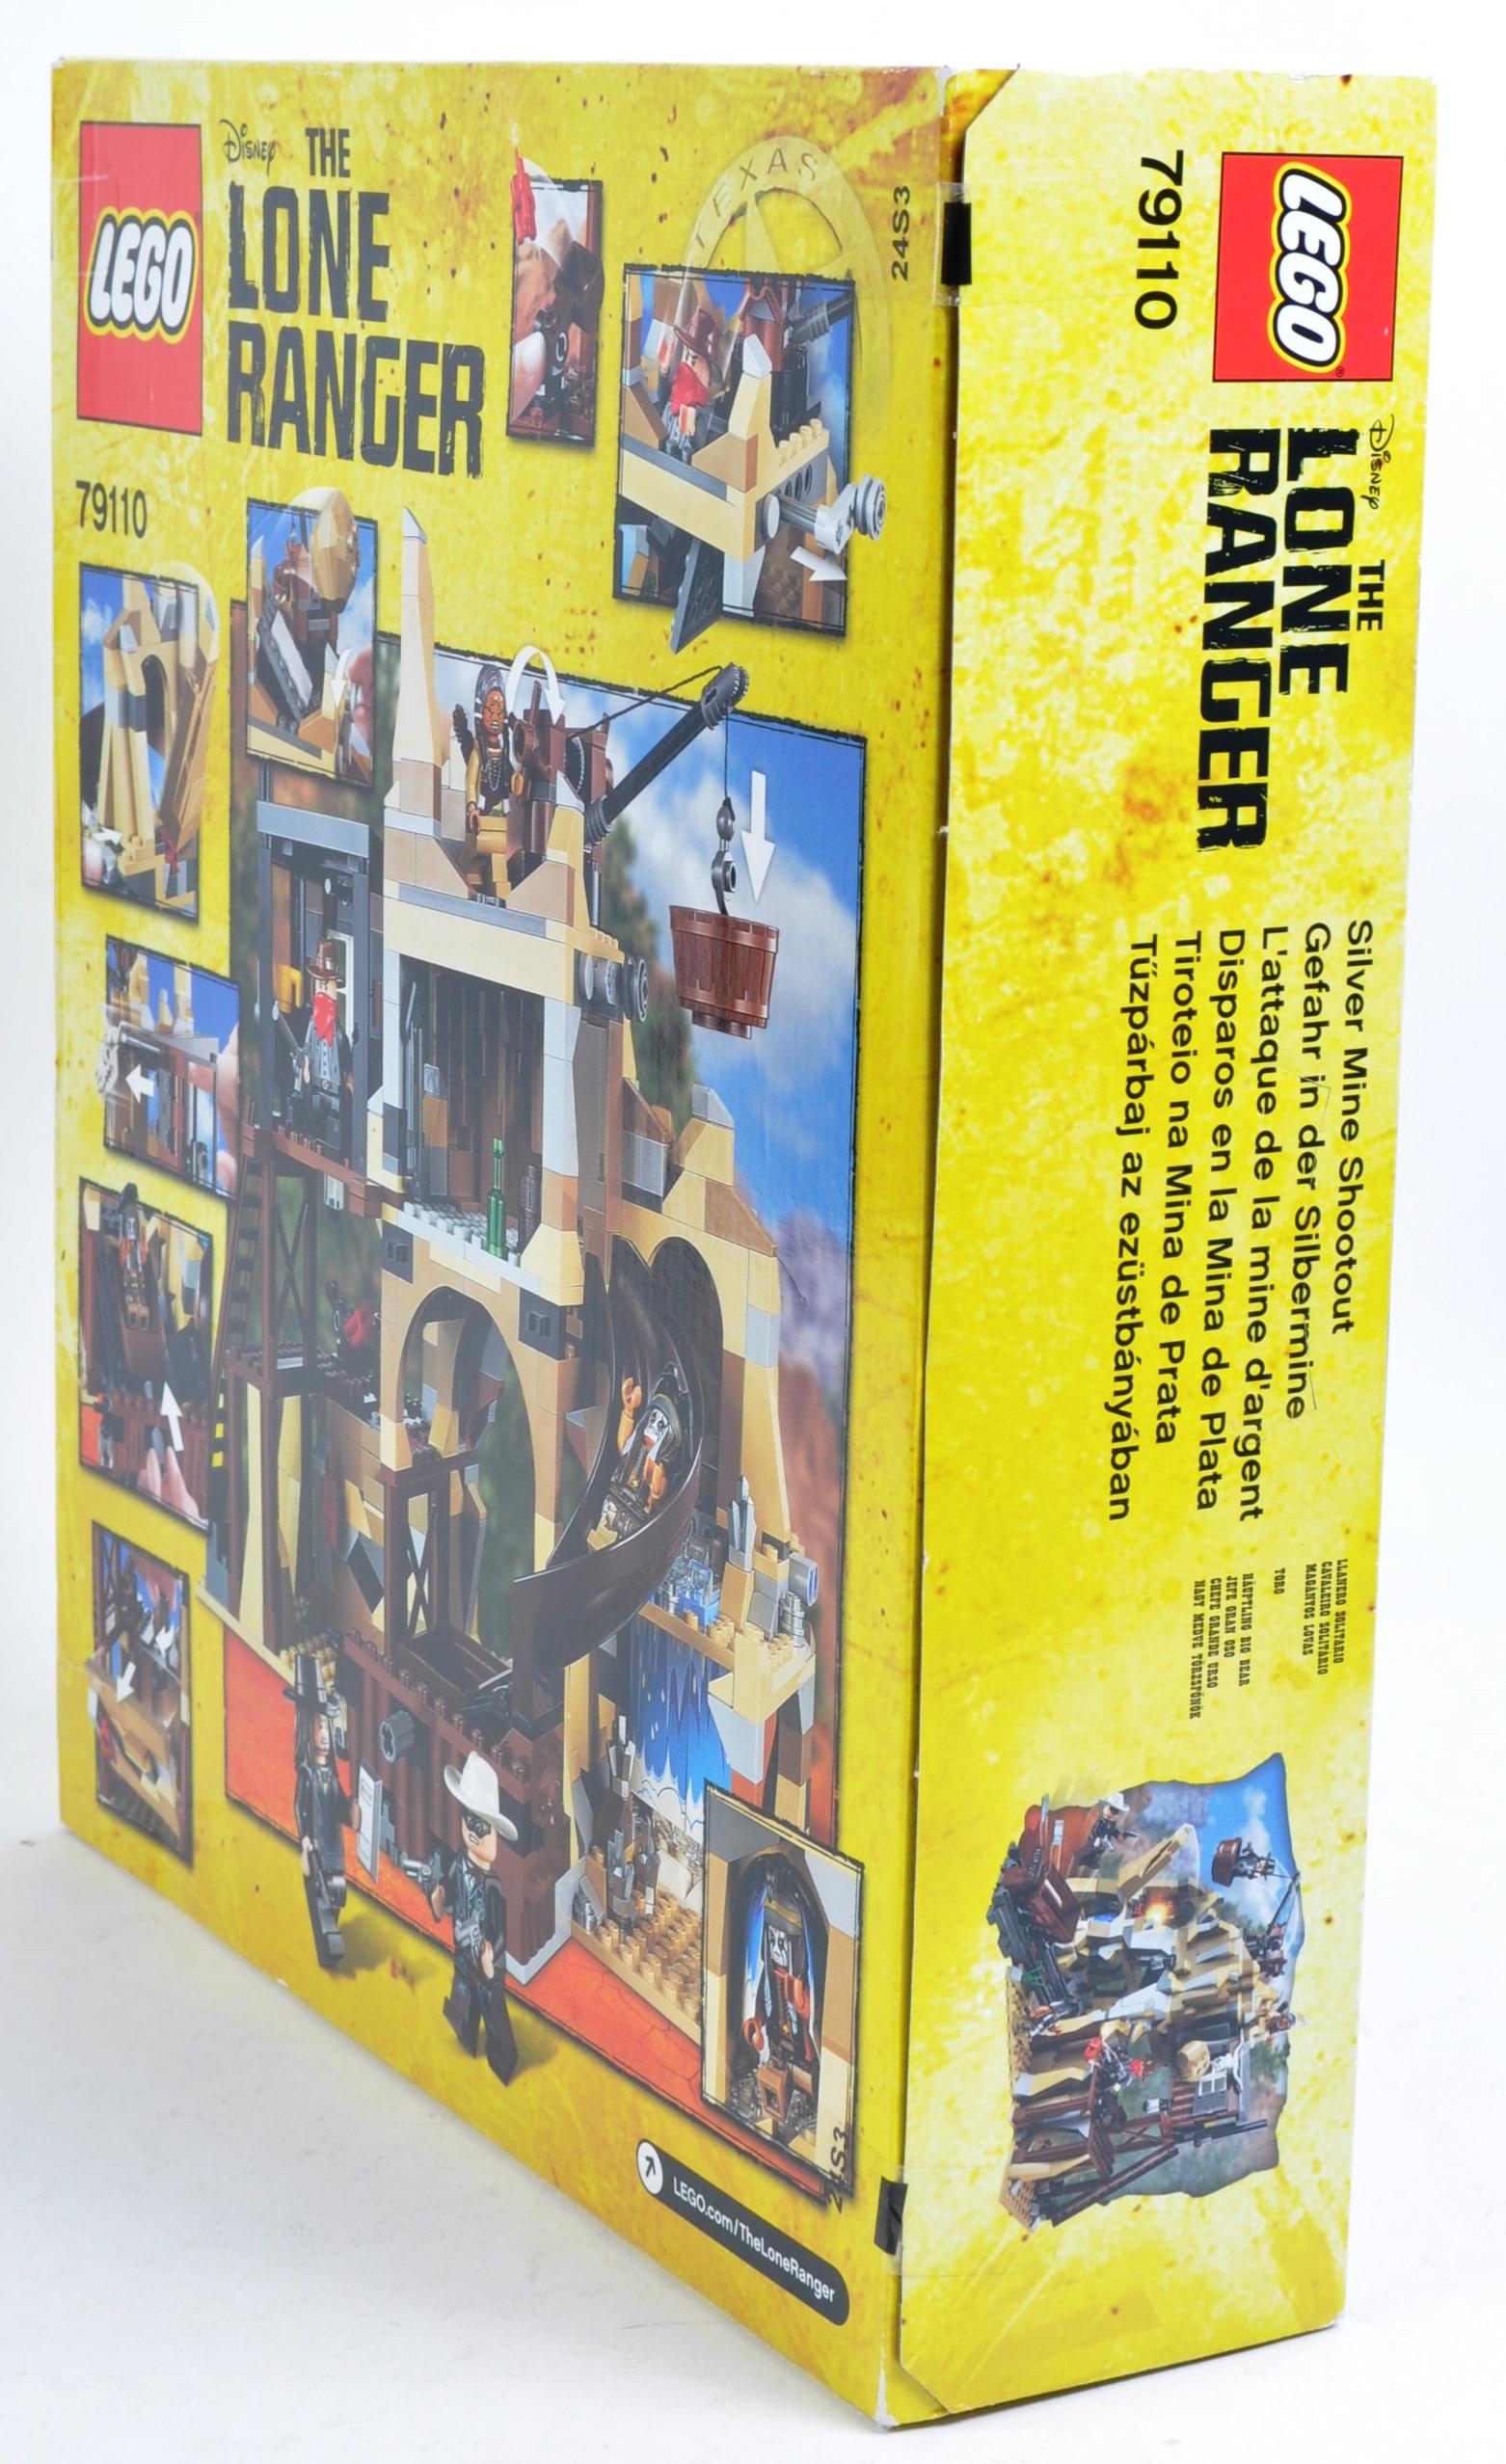 LEGO SET - THE LONE RANGER - 79110 - SILVER MINE SHOOTOUT - Image 3 of 4